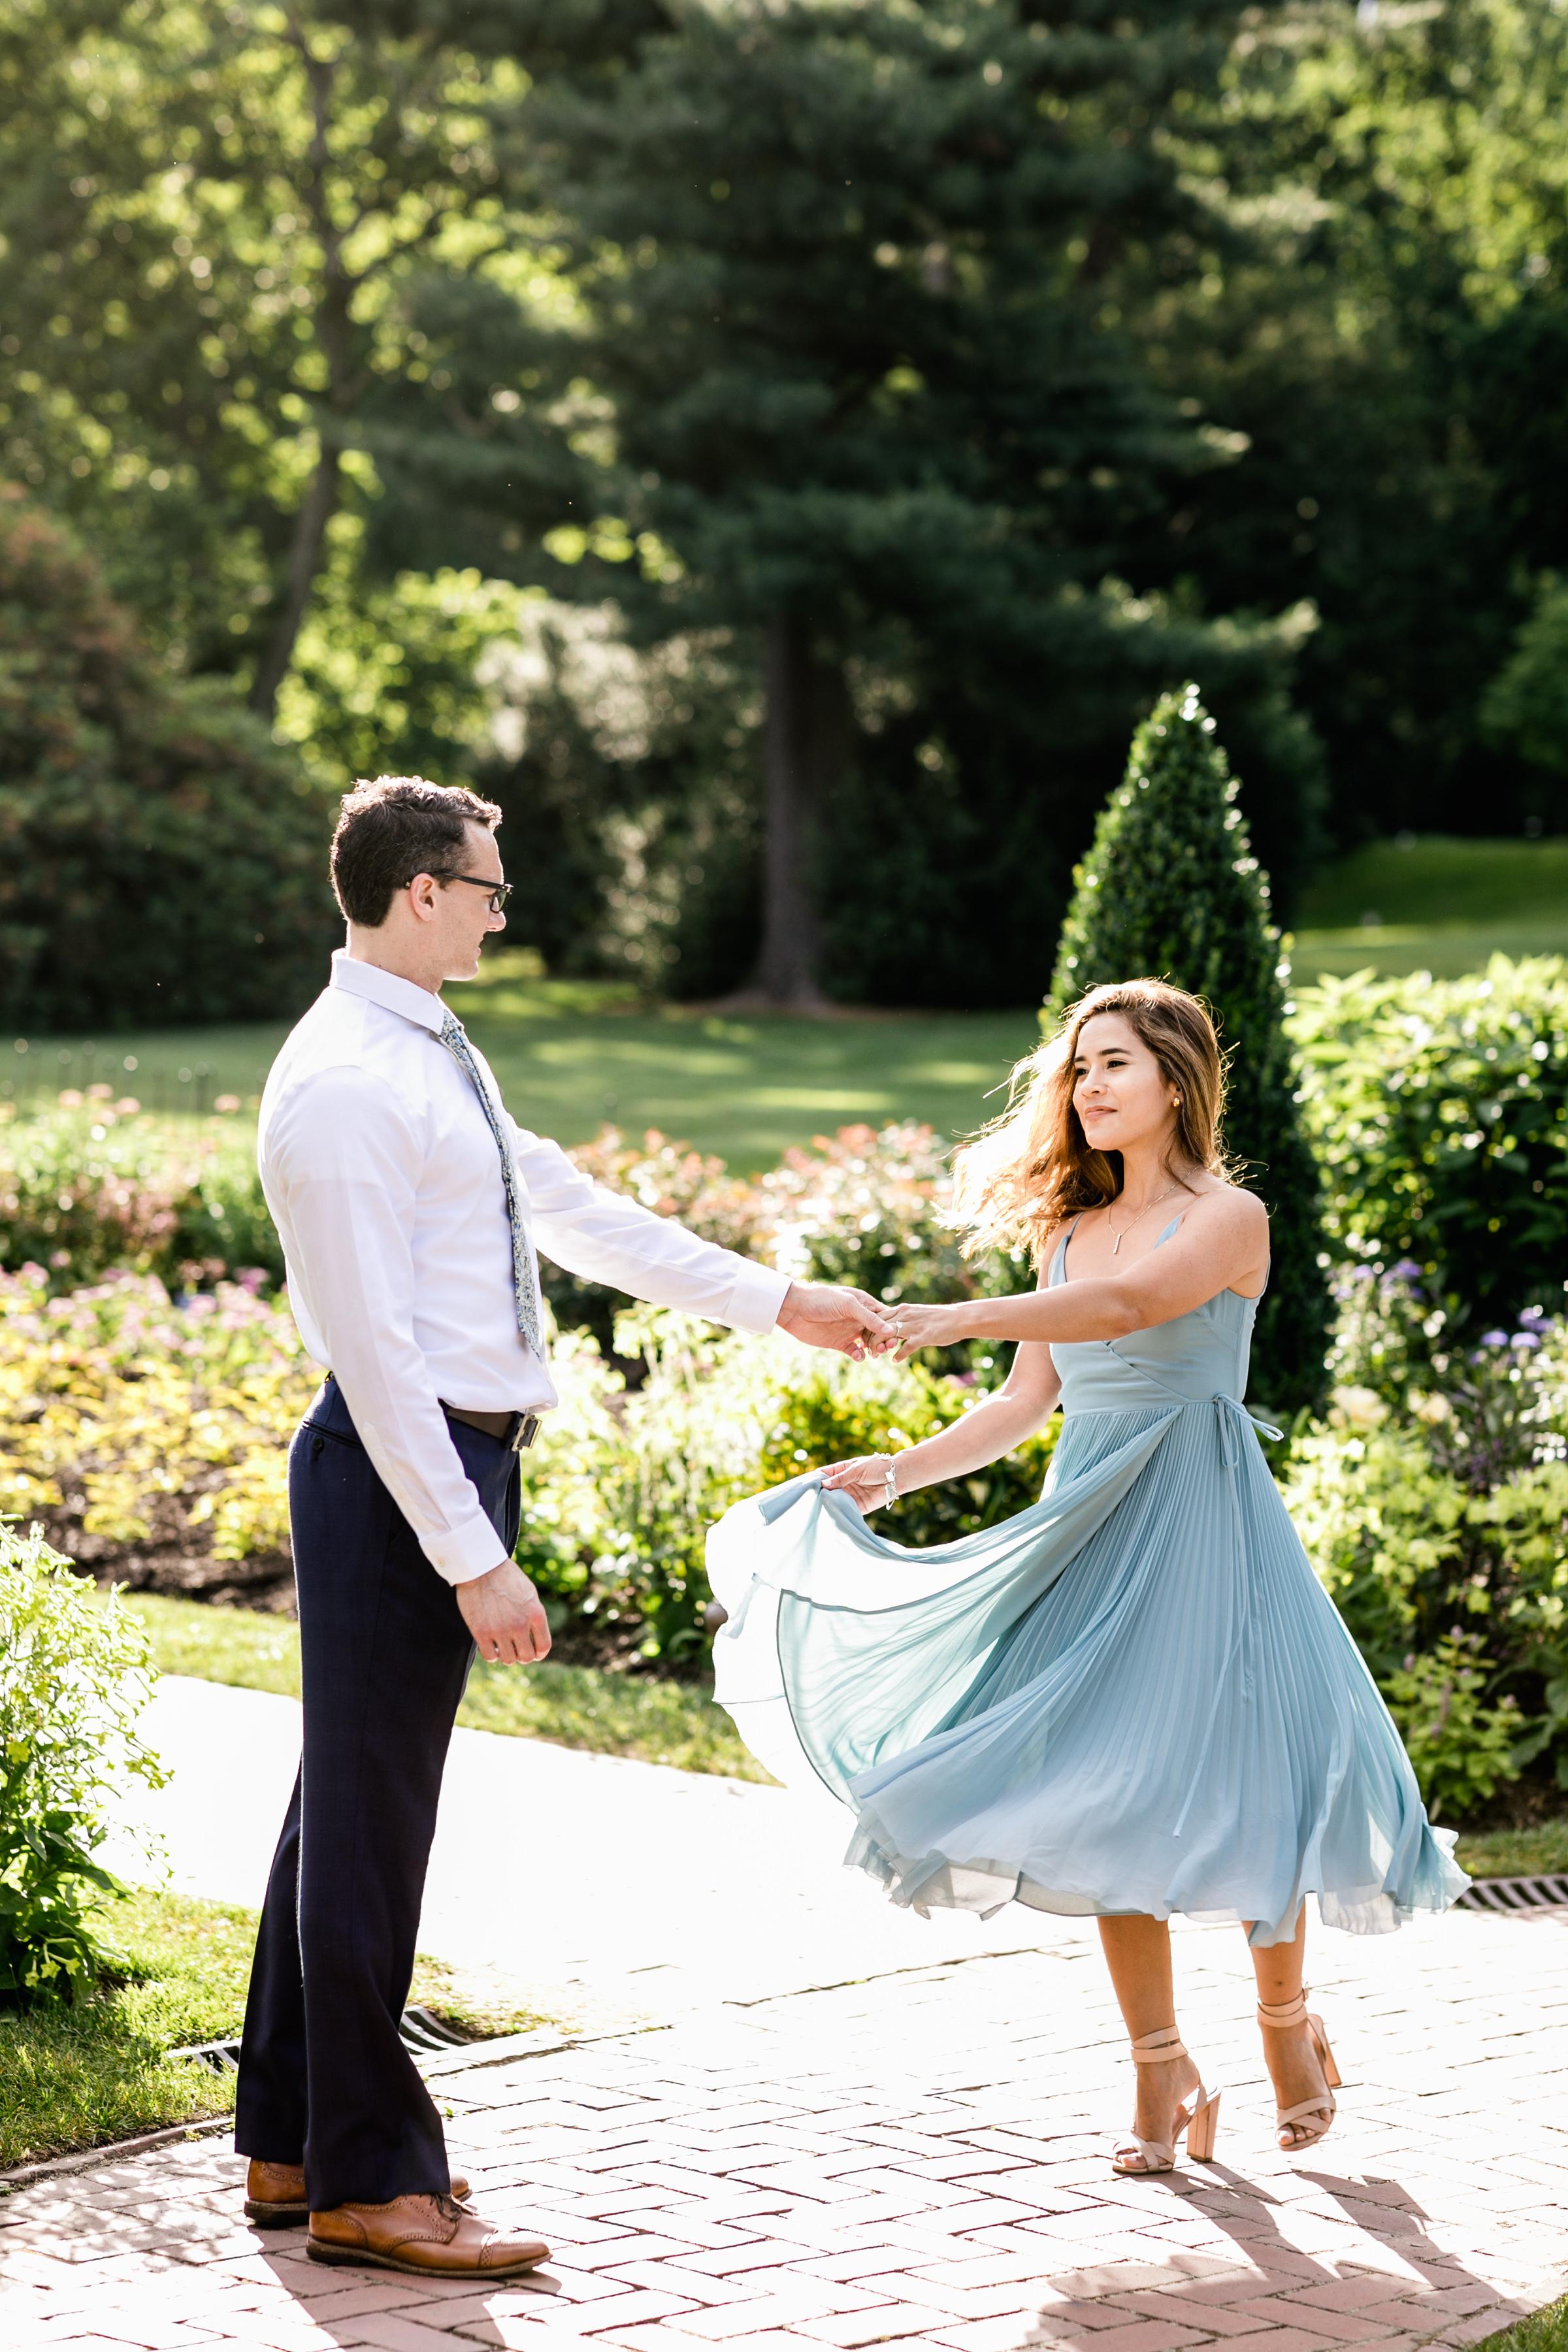 photography-natural-candid-engaged-proposal-philadelphia-wedding-longwood gardends-nature-flowers-modern-lifestyle-08.JPG